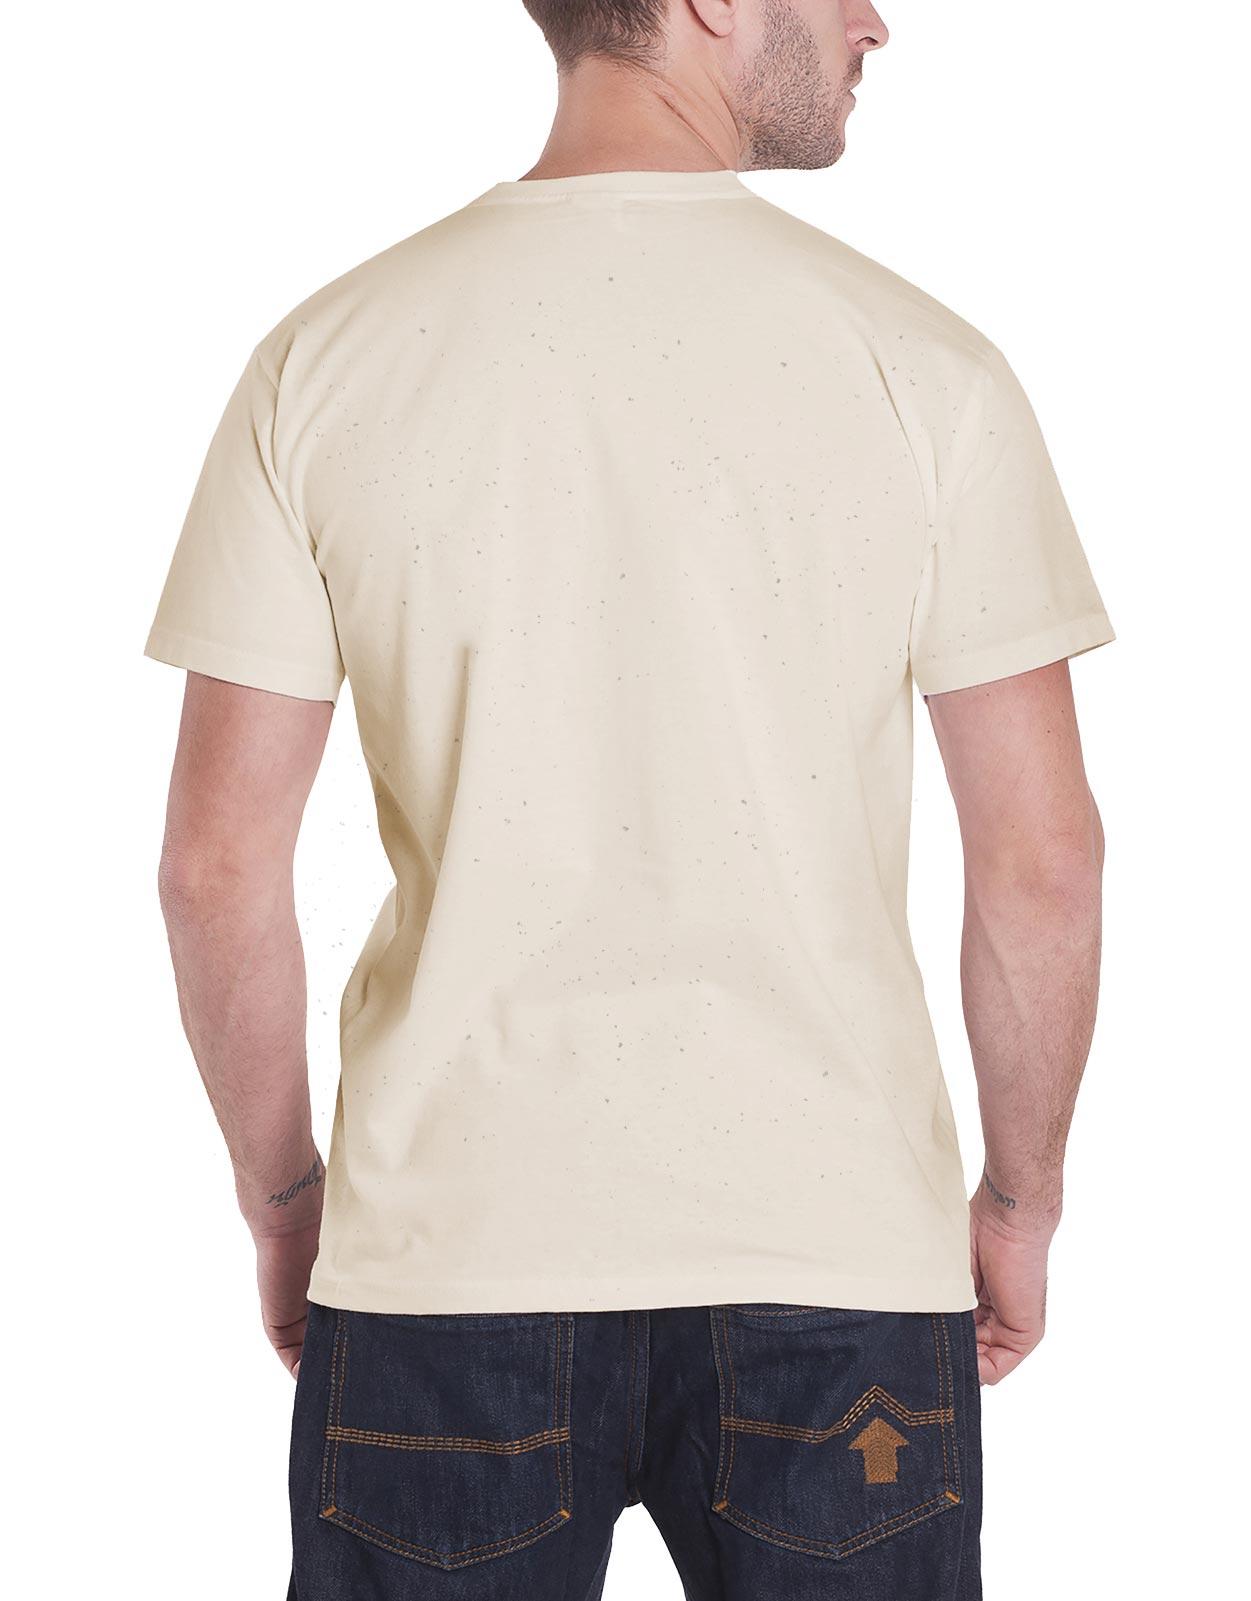 Official-Motley-Crue-T-Shirt-Shout-at-the-Devil-The-Dirt-Tour-Band-Logo-Mens thumbnail 11